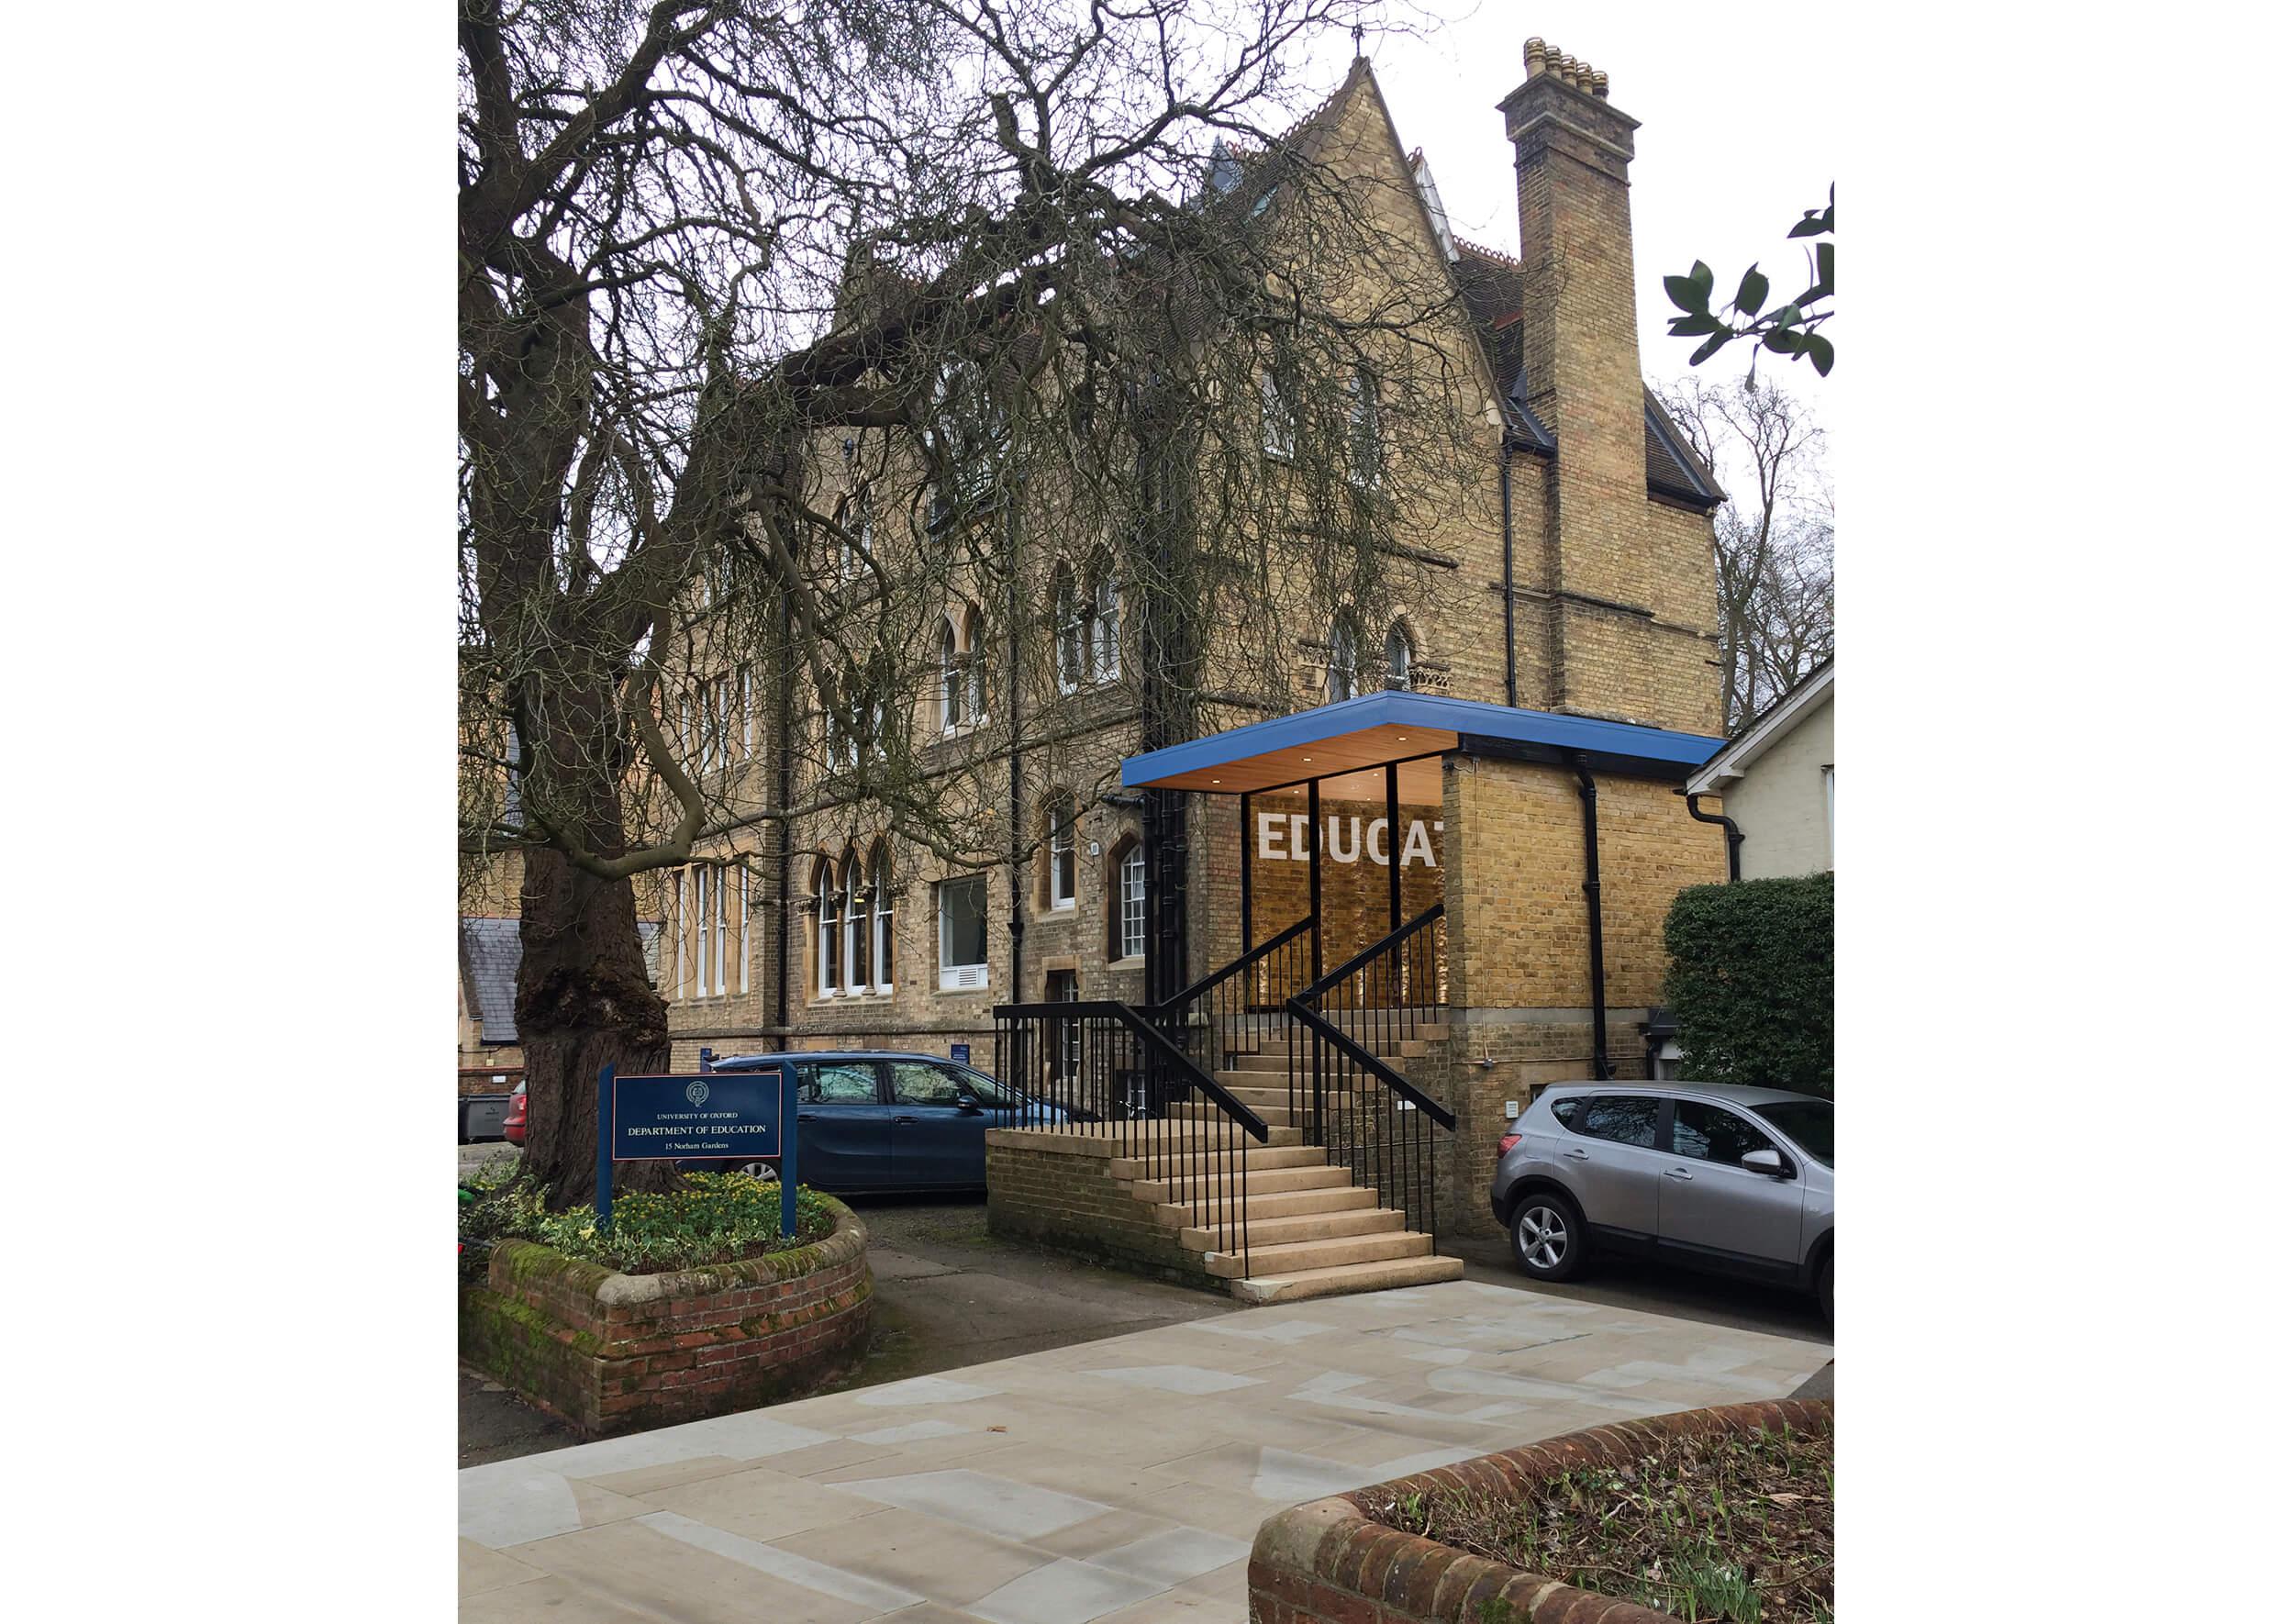 Oxford-University-Education-Bizley-Architect-Entrance-Norham-900.jpg